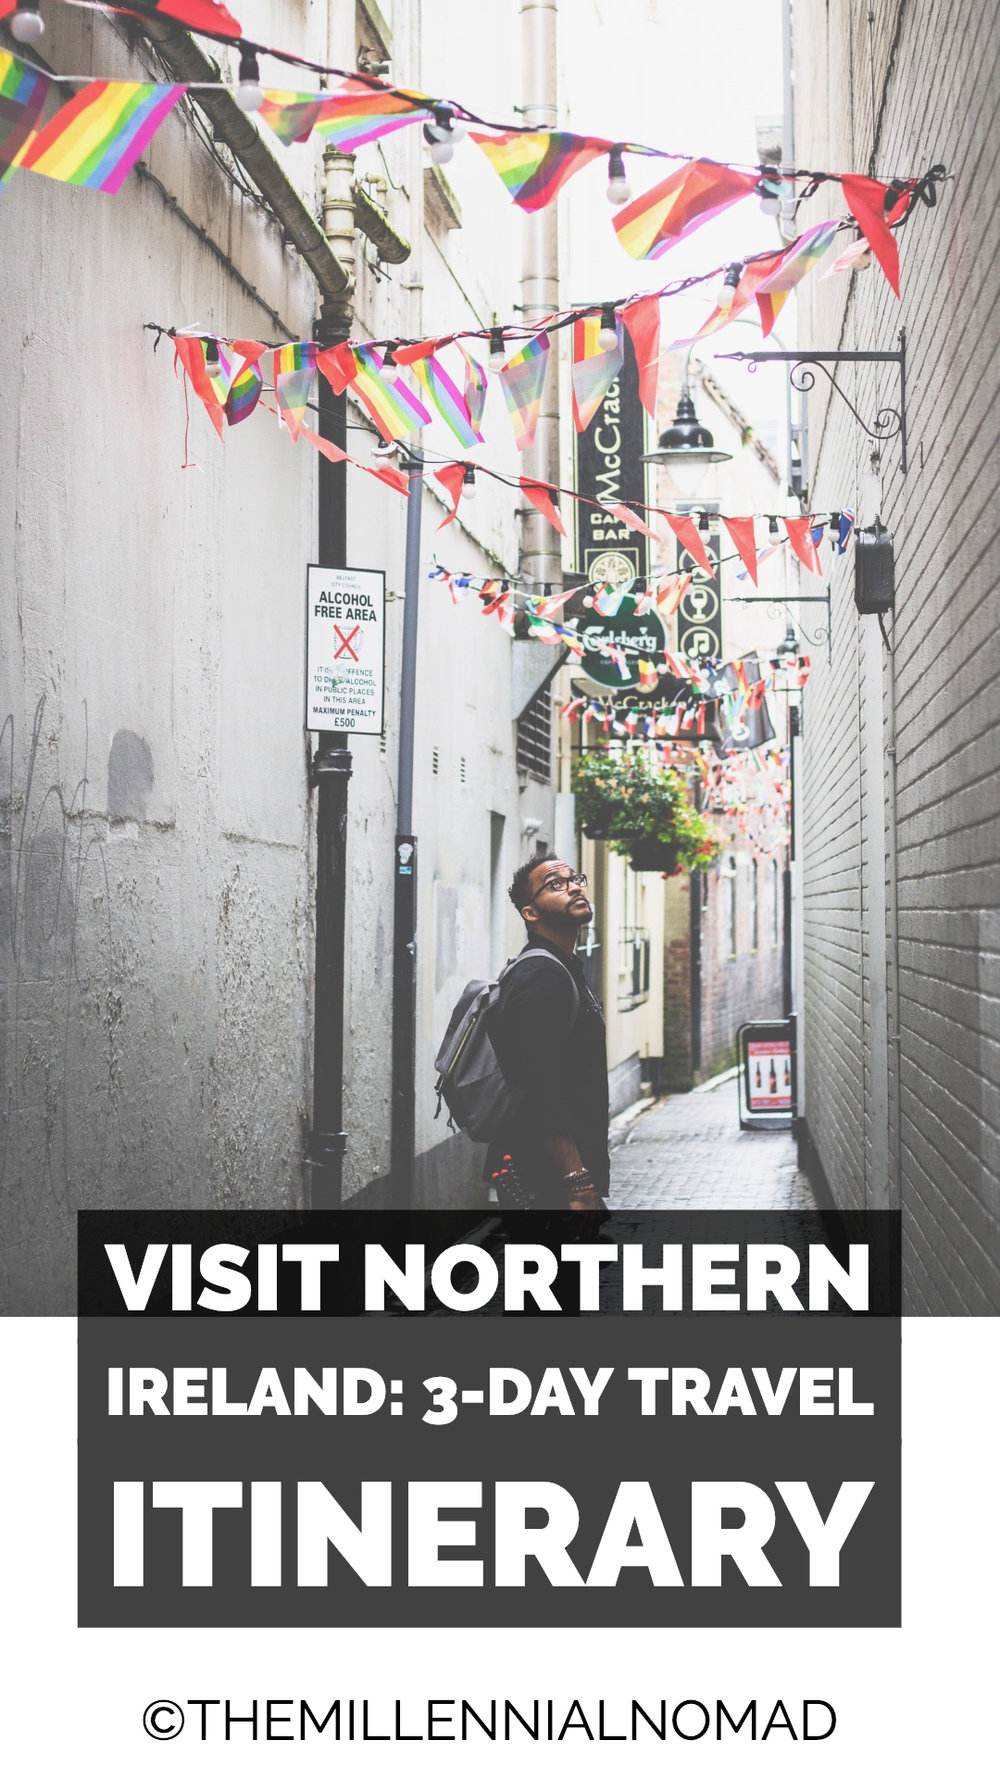 visit northern ireland: 3 day travel itinerary